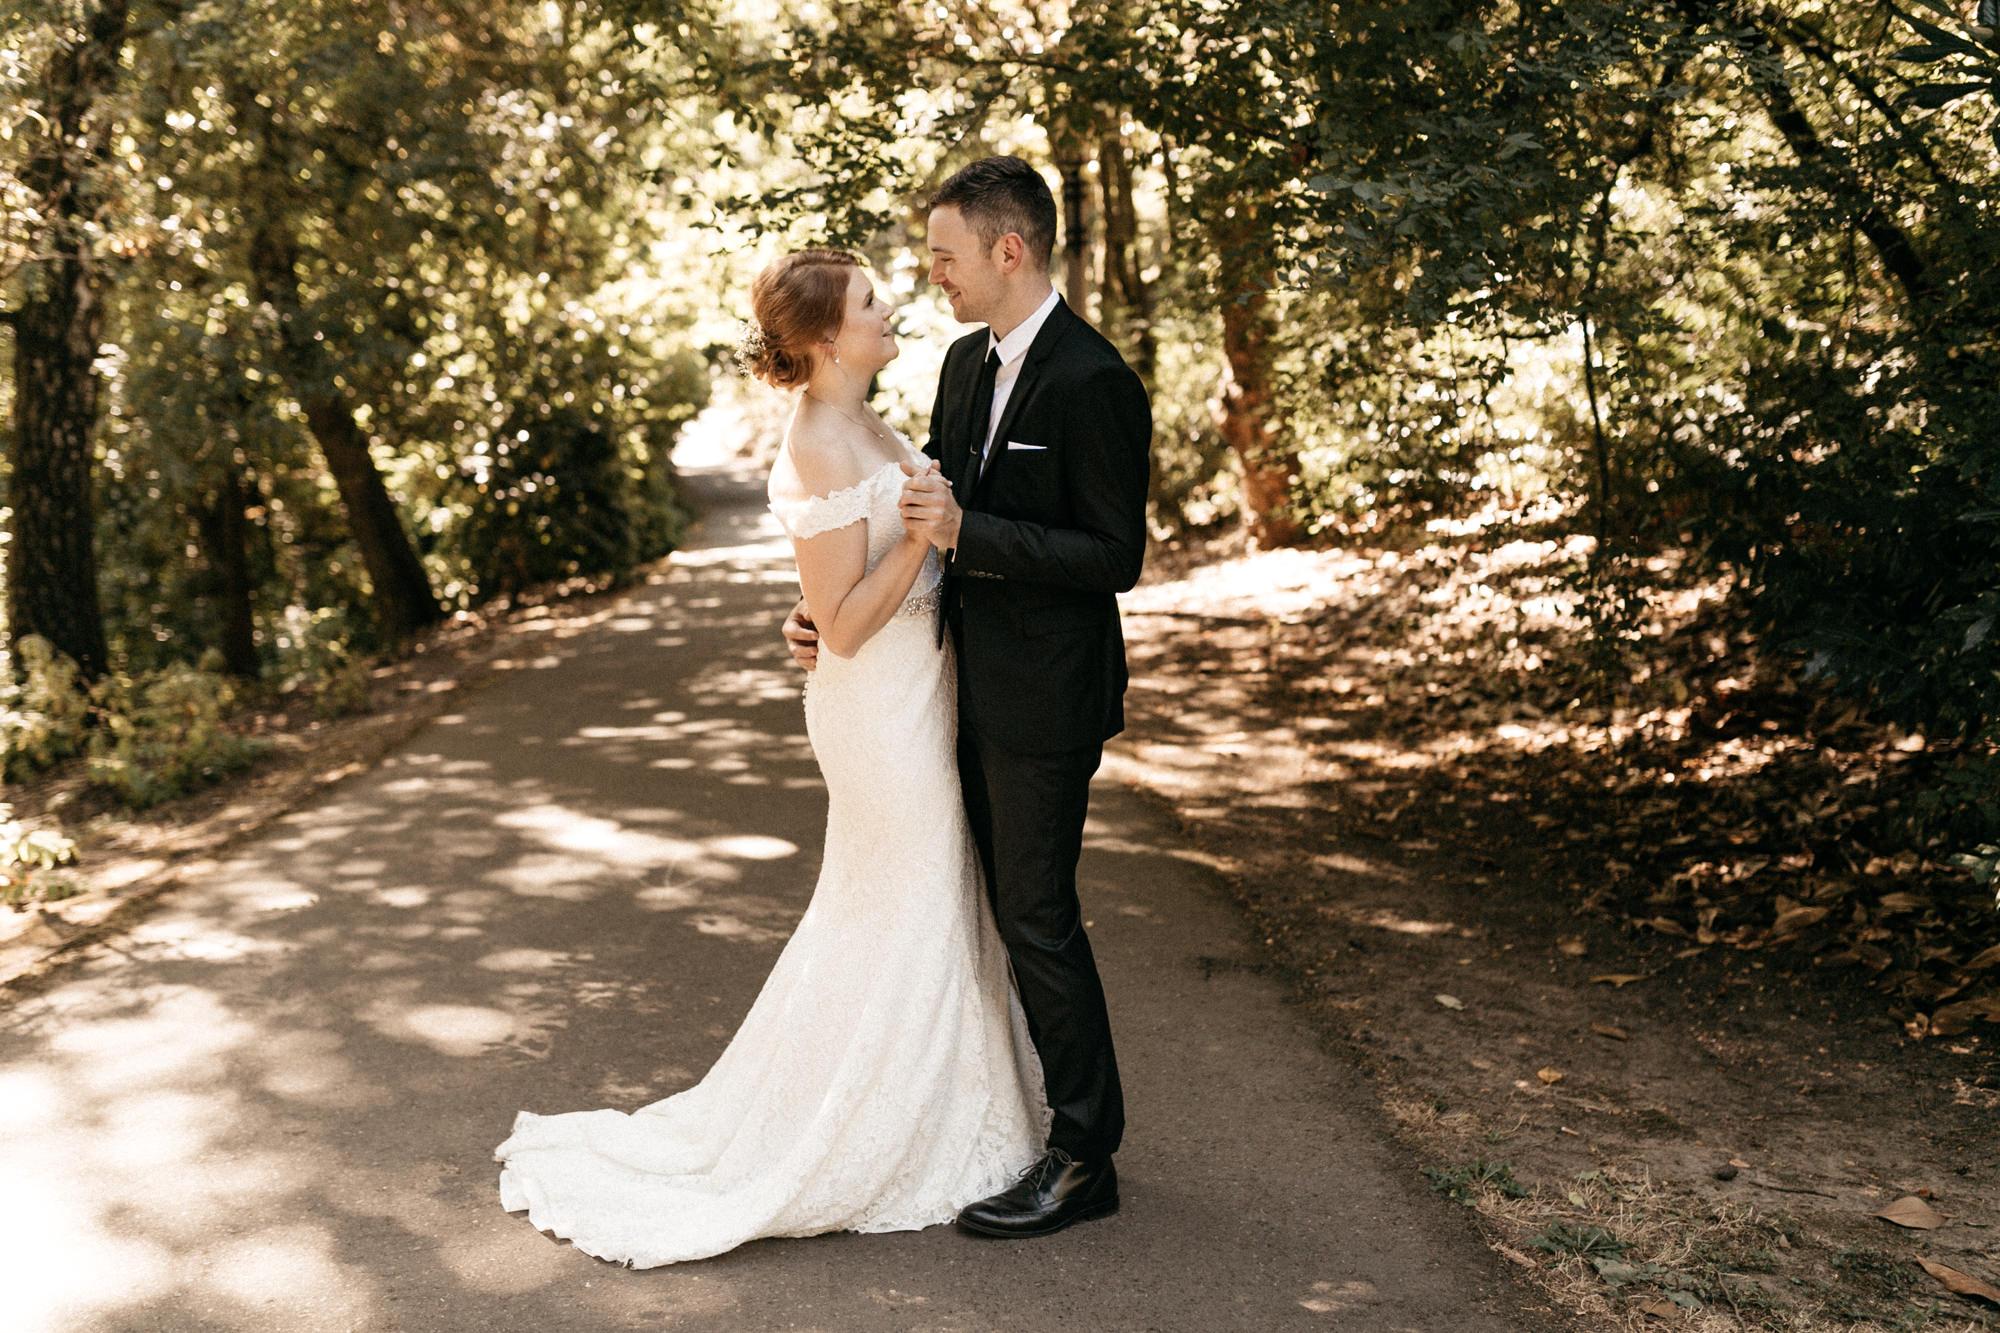 the_evergreen_portland_wedding-43.jpg